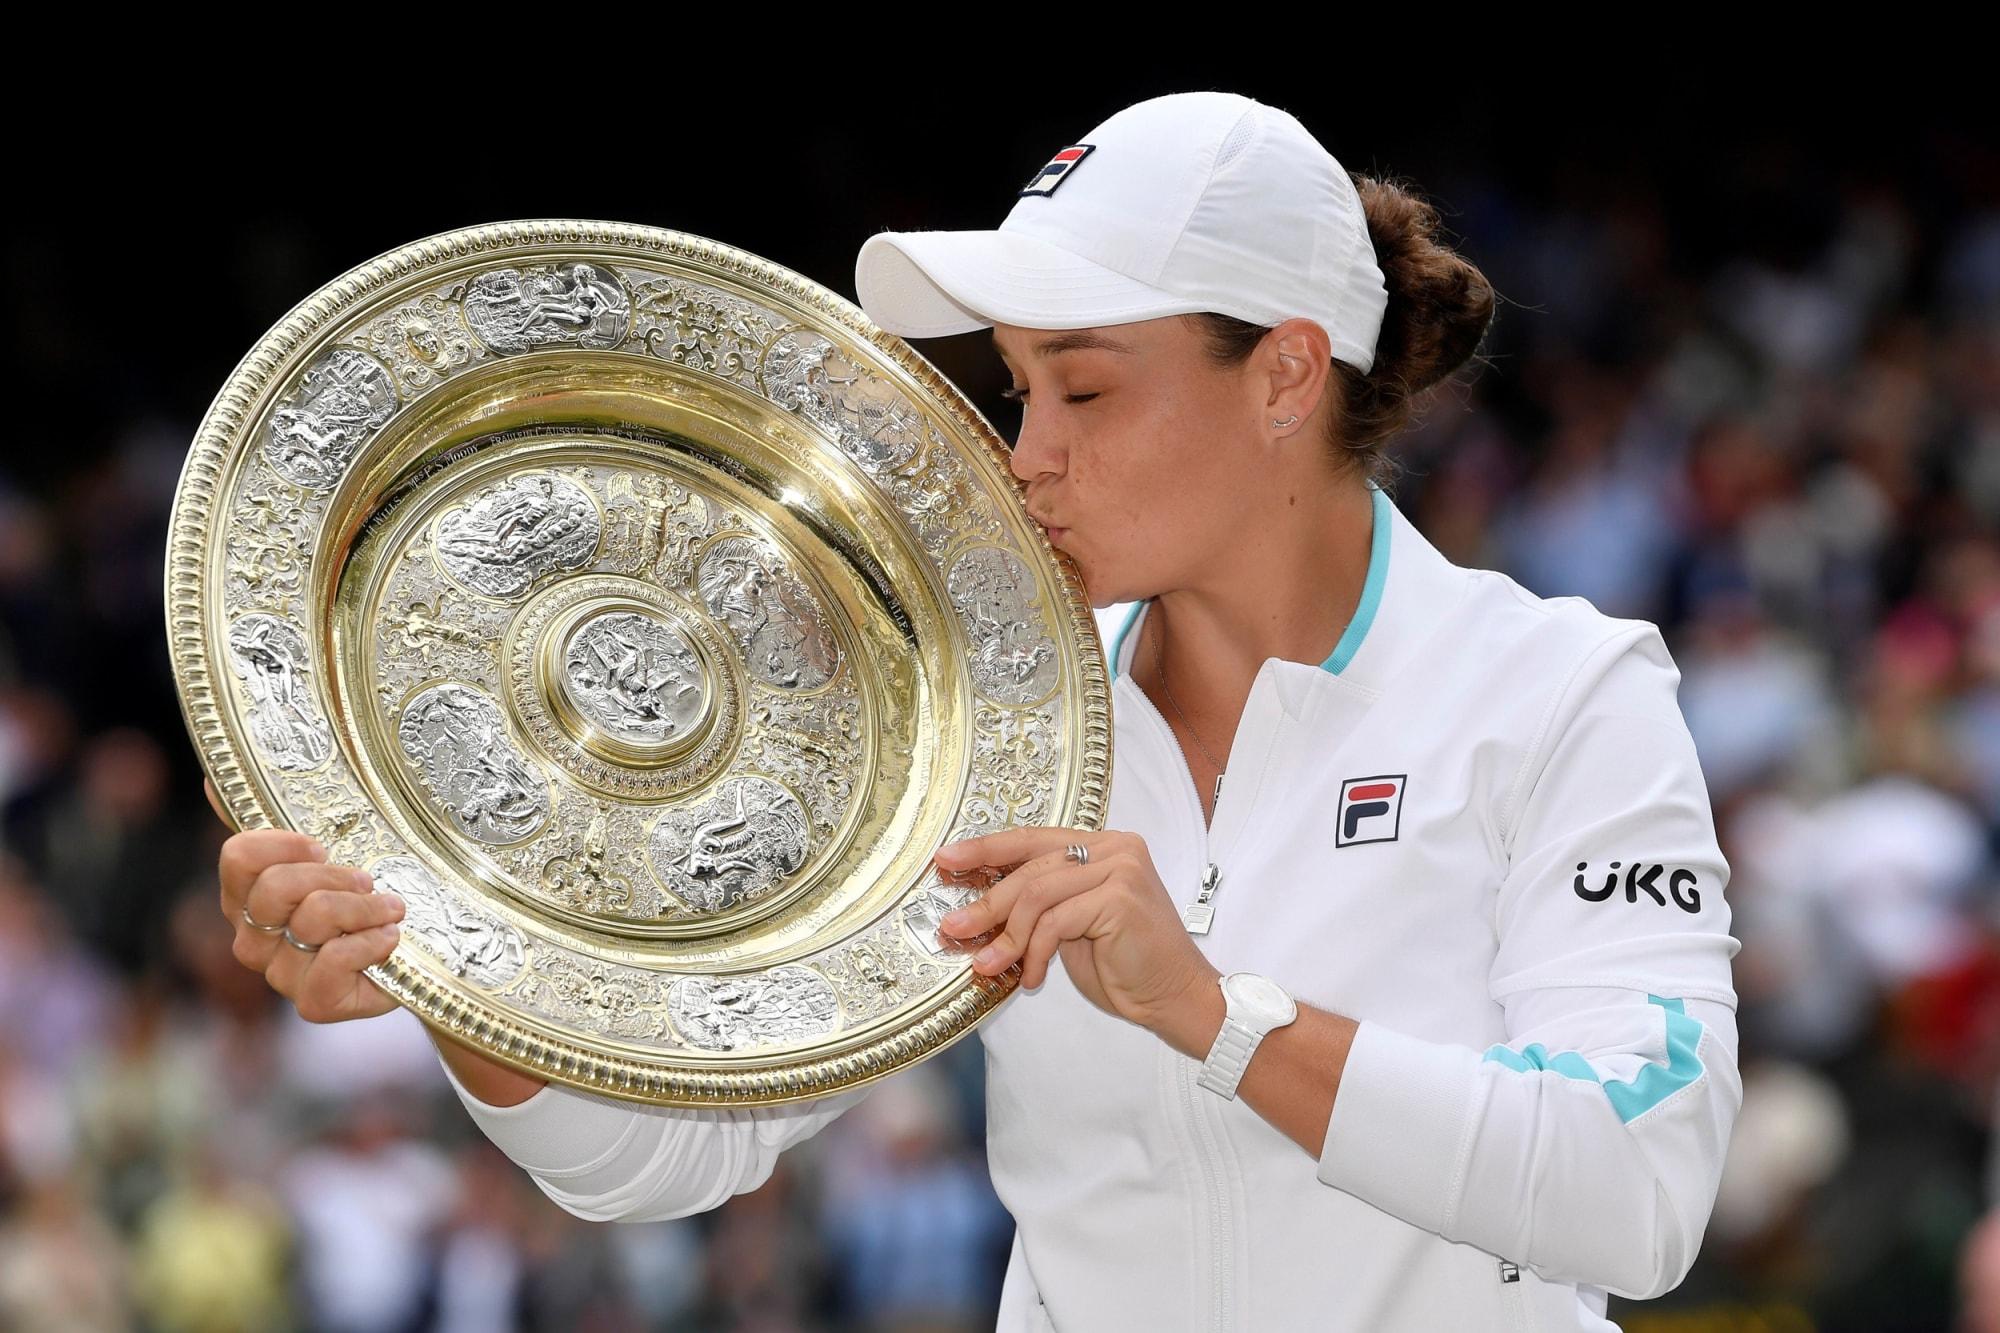 Ashleigh Barty Defeats Karolina Pliskova to Win First Wimbledon Title